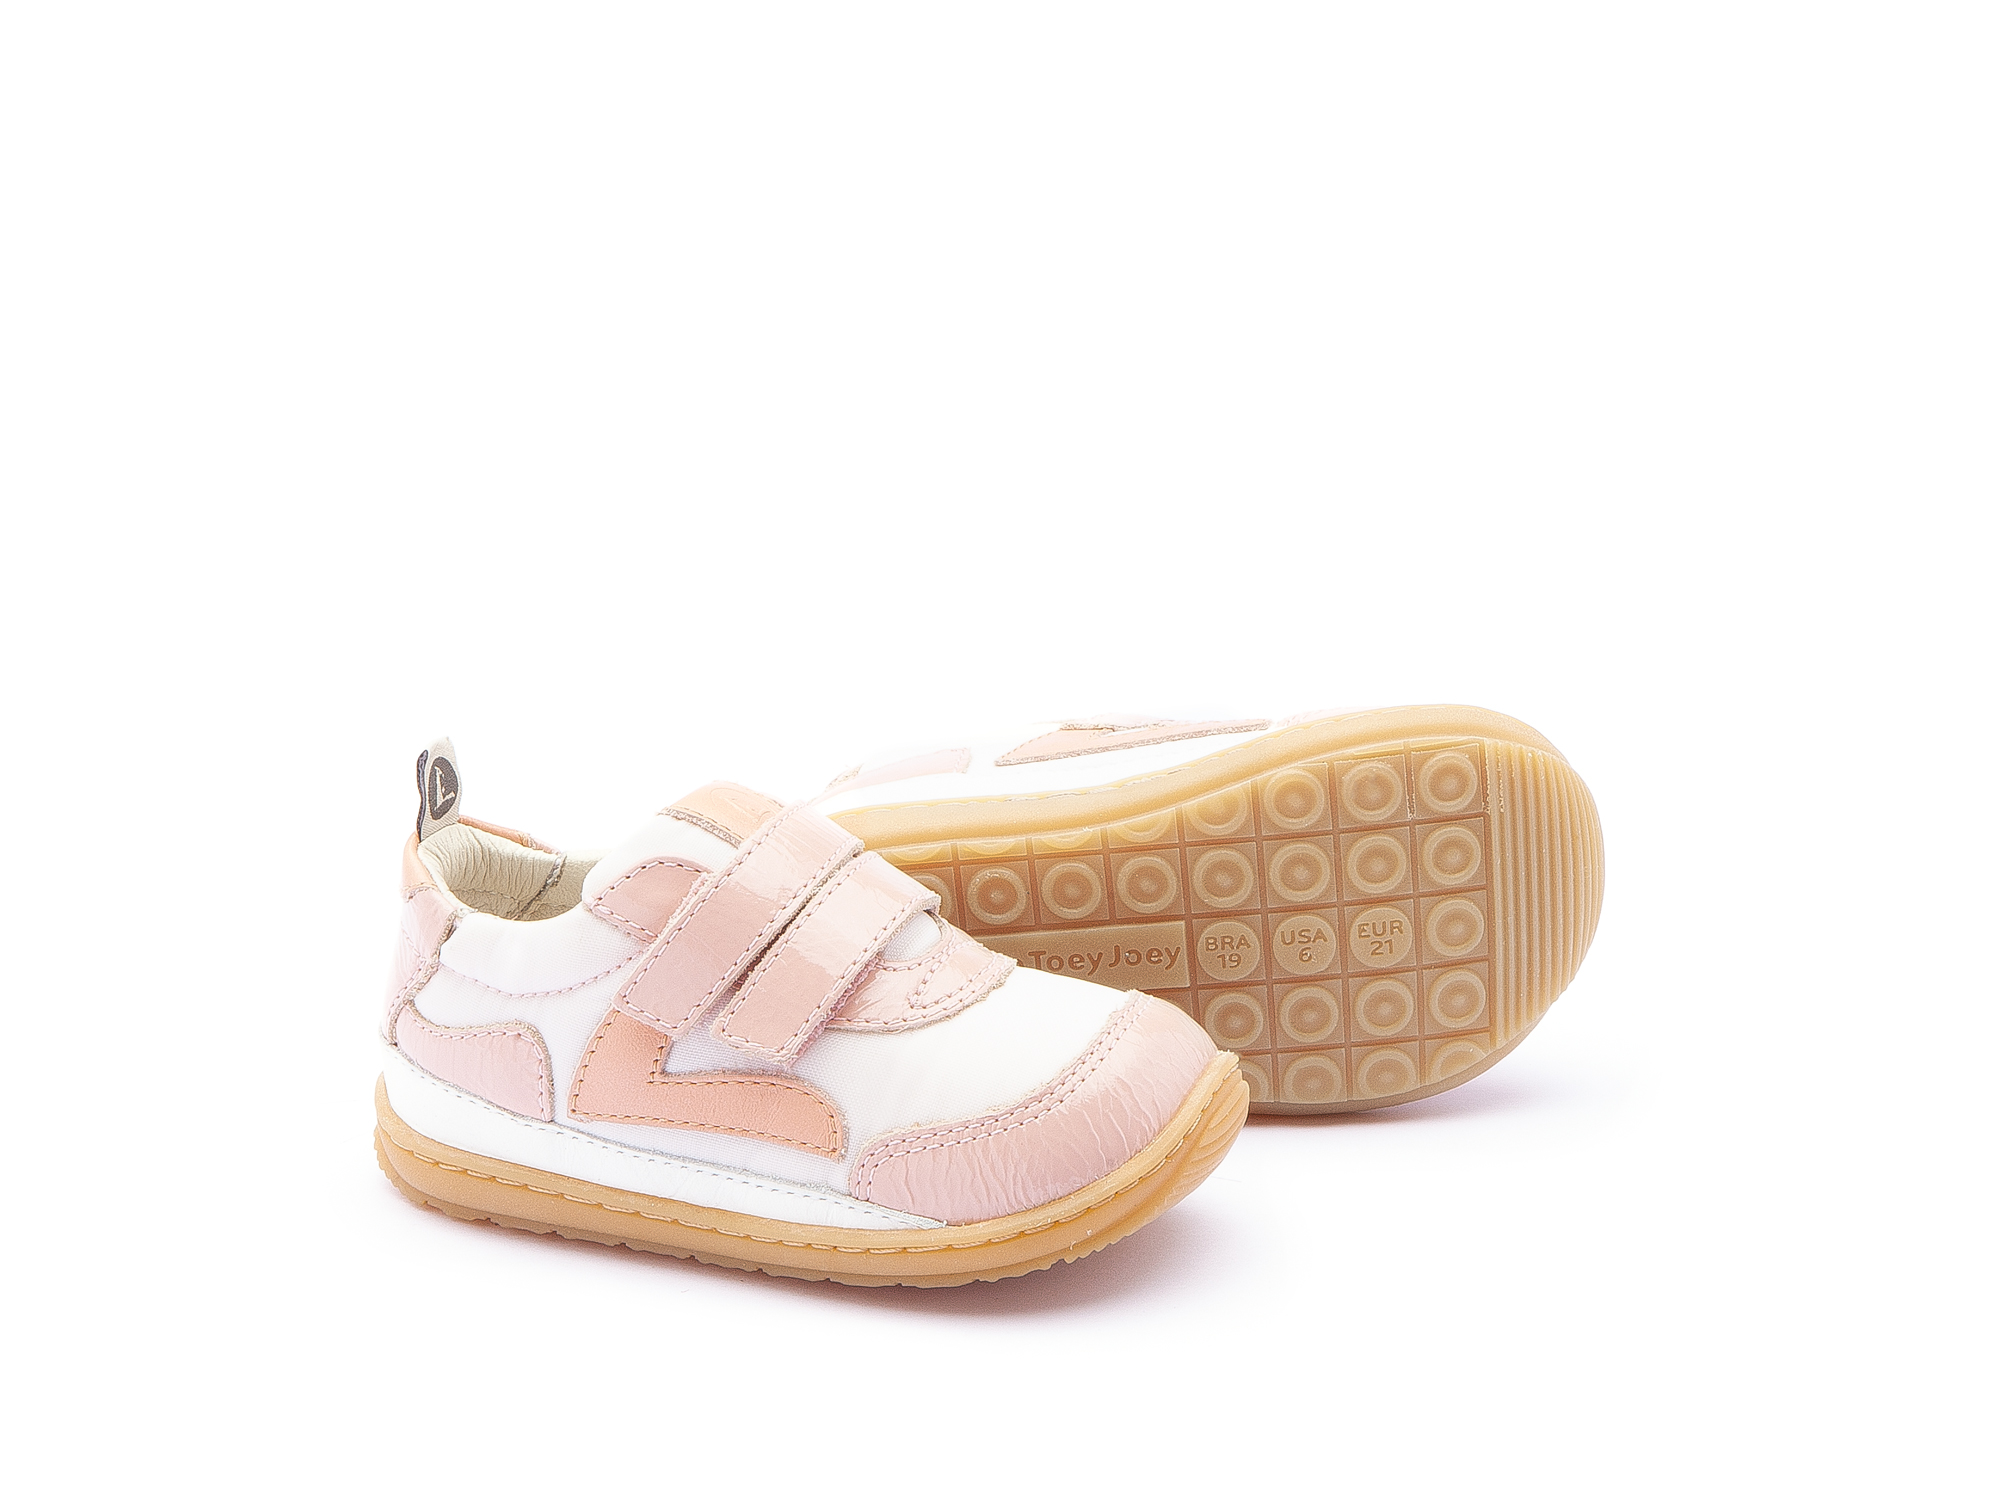 Sneaker Casual Jumpy Light Pink Nylon/ Patent Blush Baby 0 à 2 anos - 2